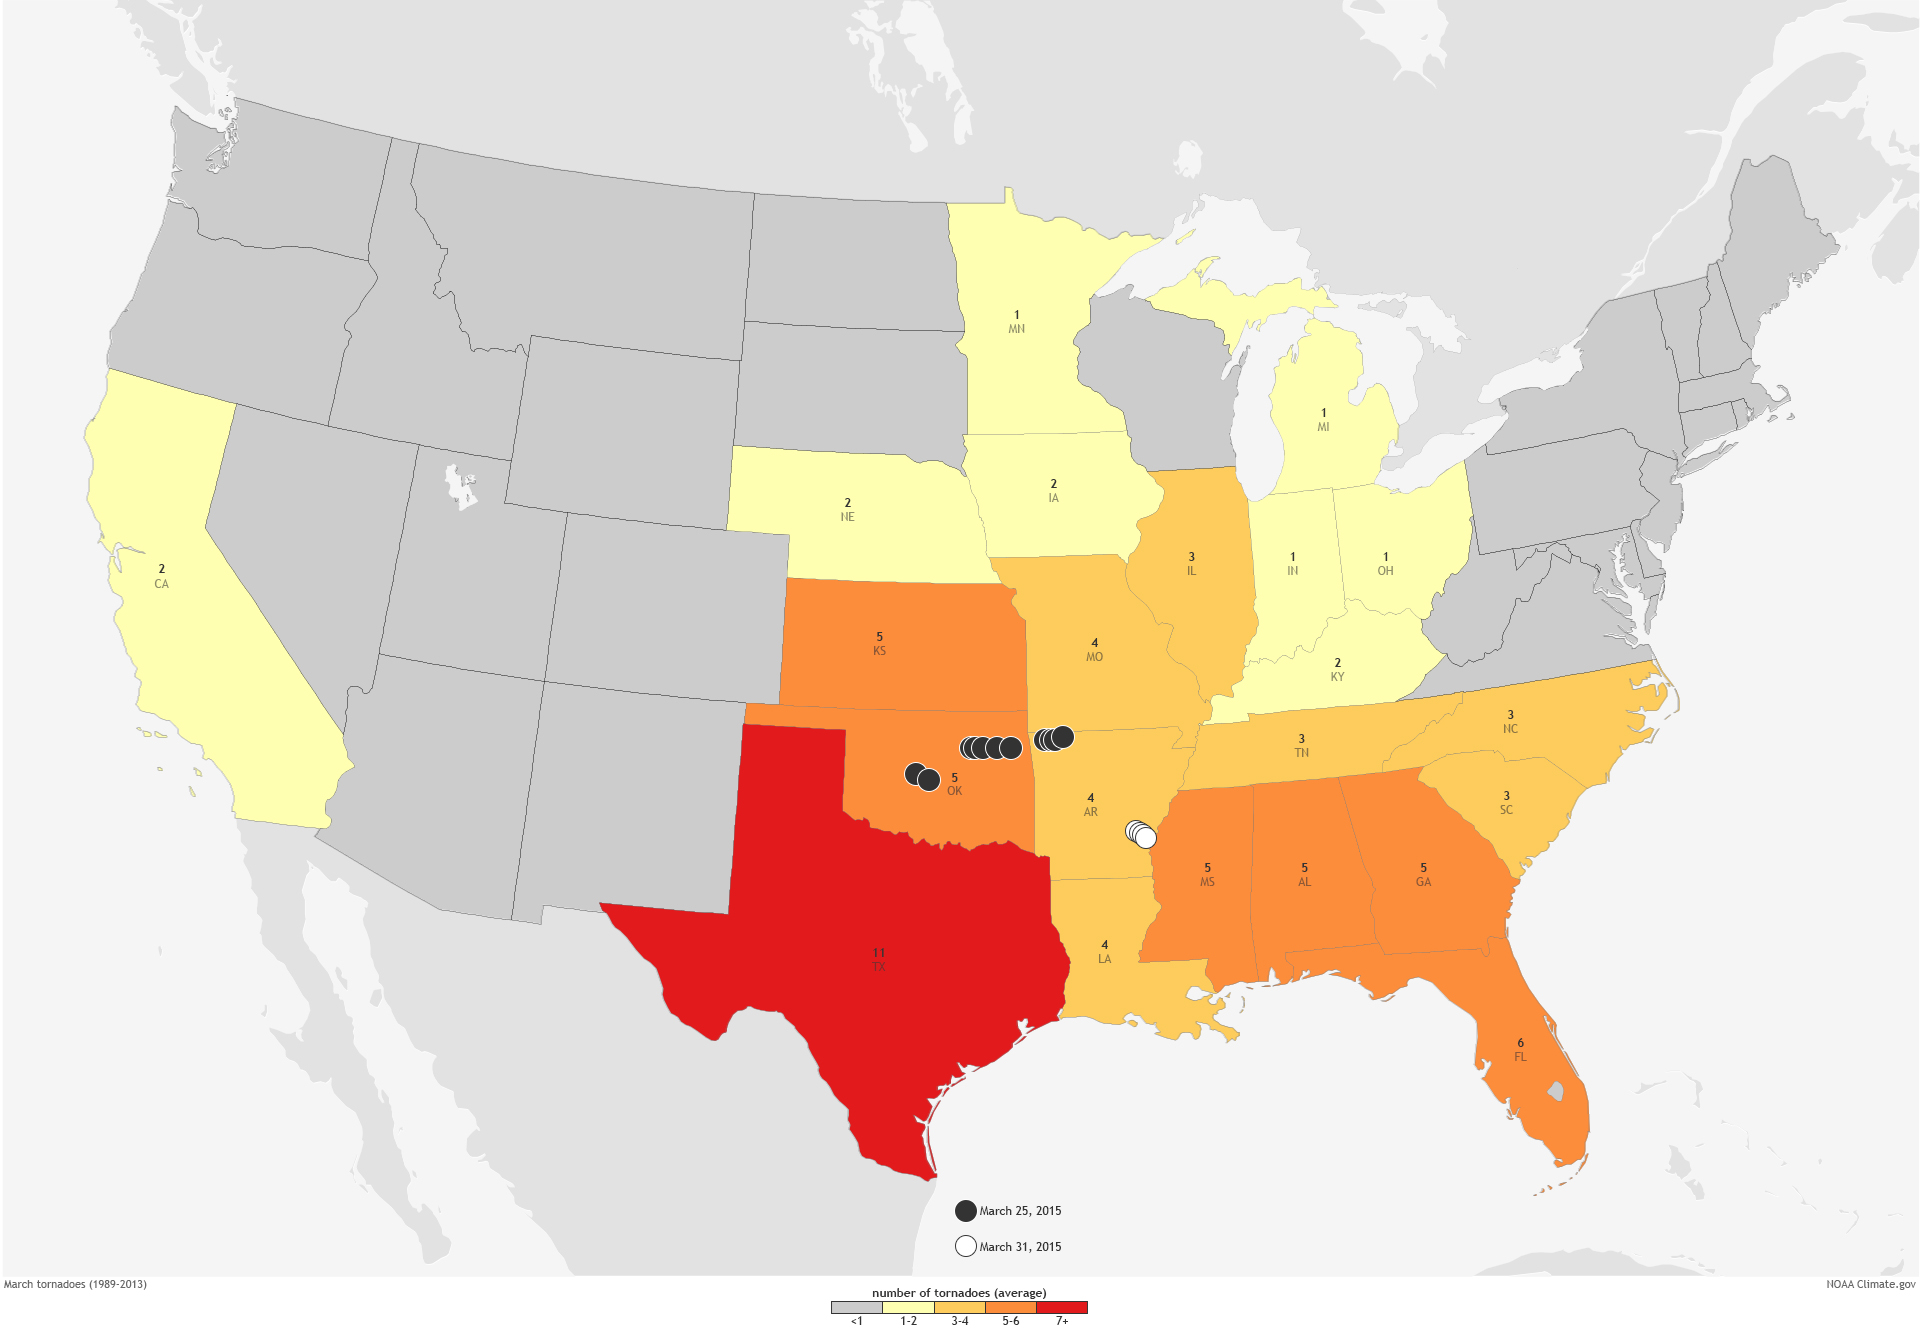 The Arkansas Weather Blog New Tornado Statistics Arkansas IS - Us weather map march